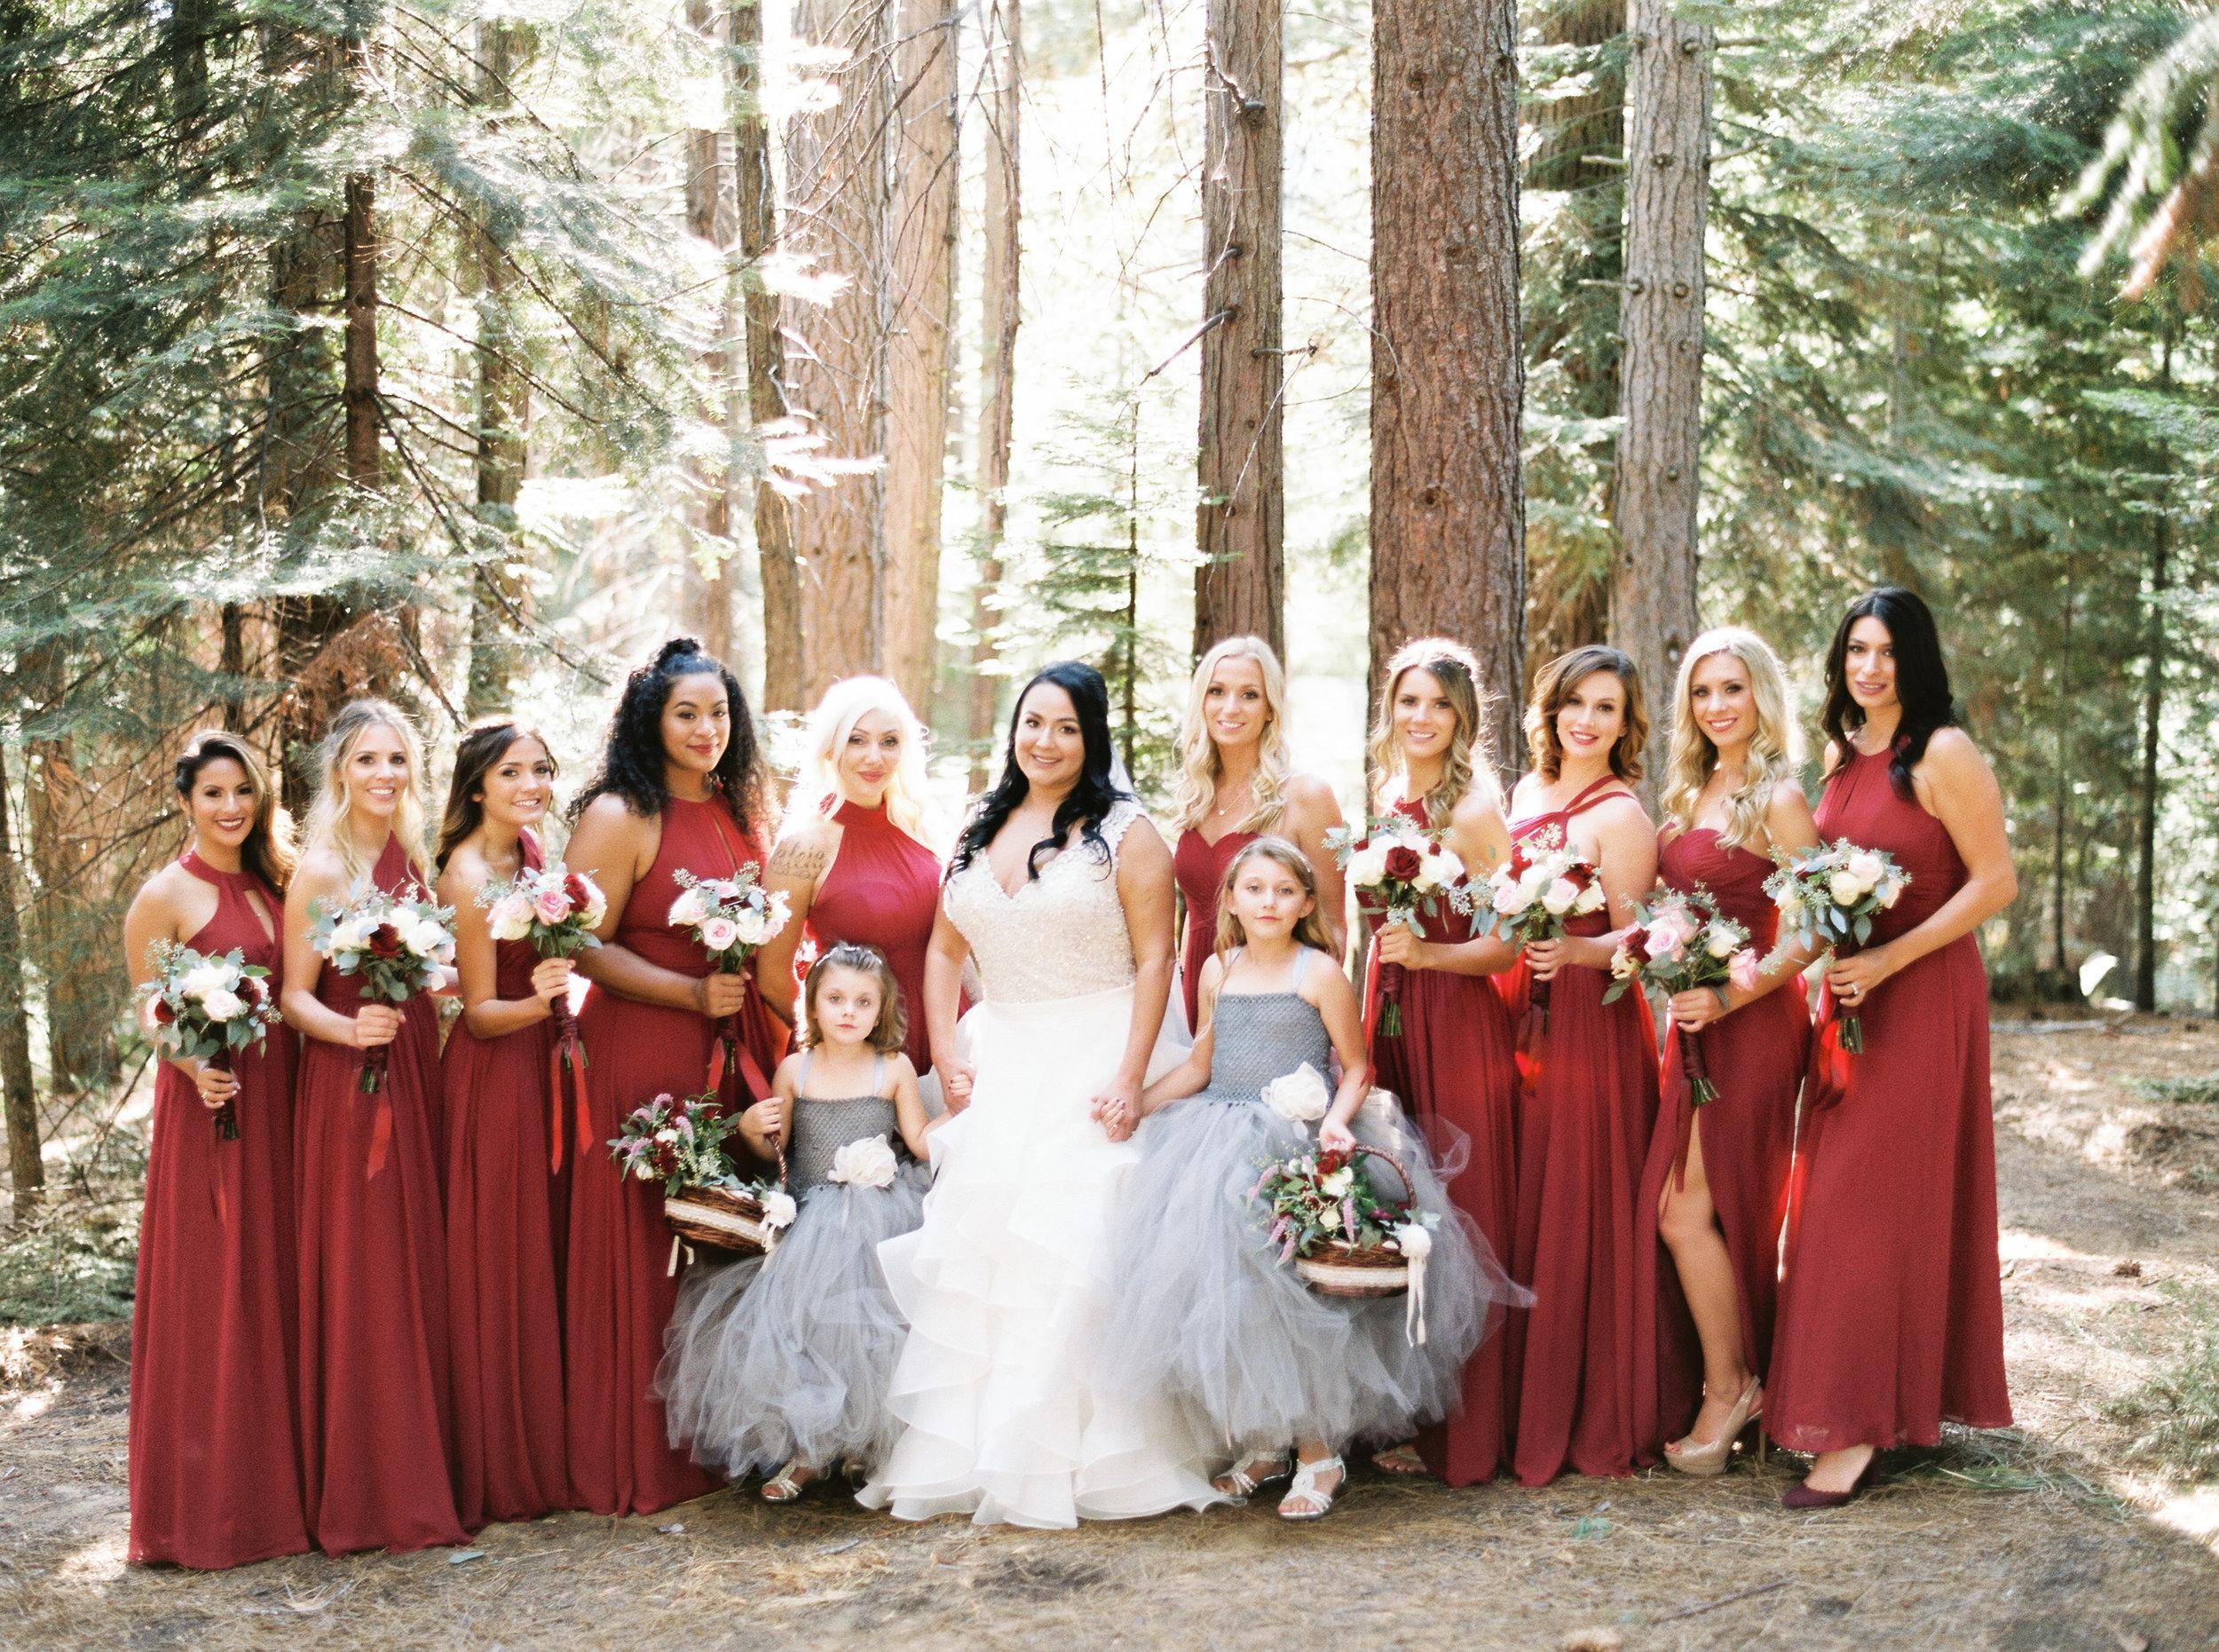 Tenaya-lodge-wedding-at-yosemite-national-park-california-47.jpg